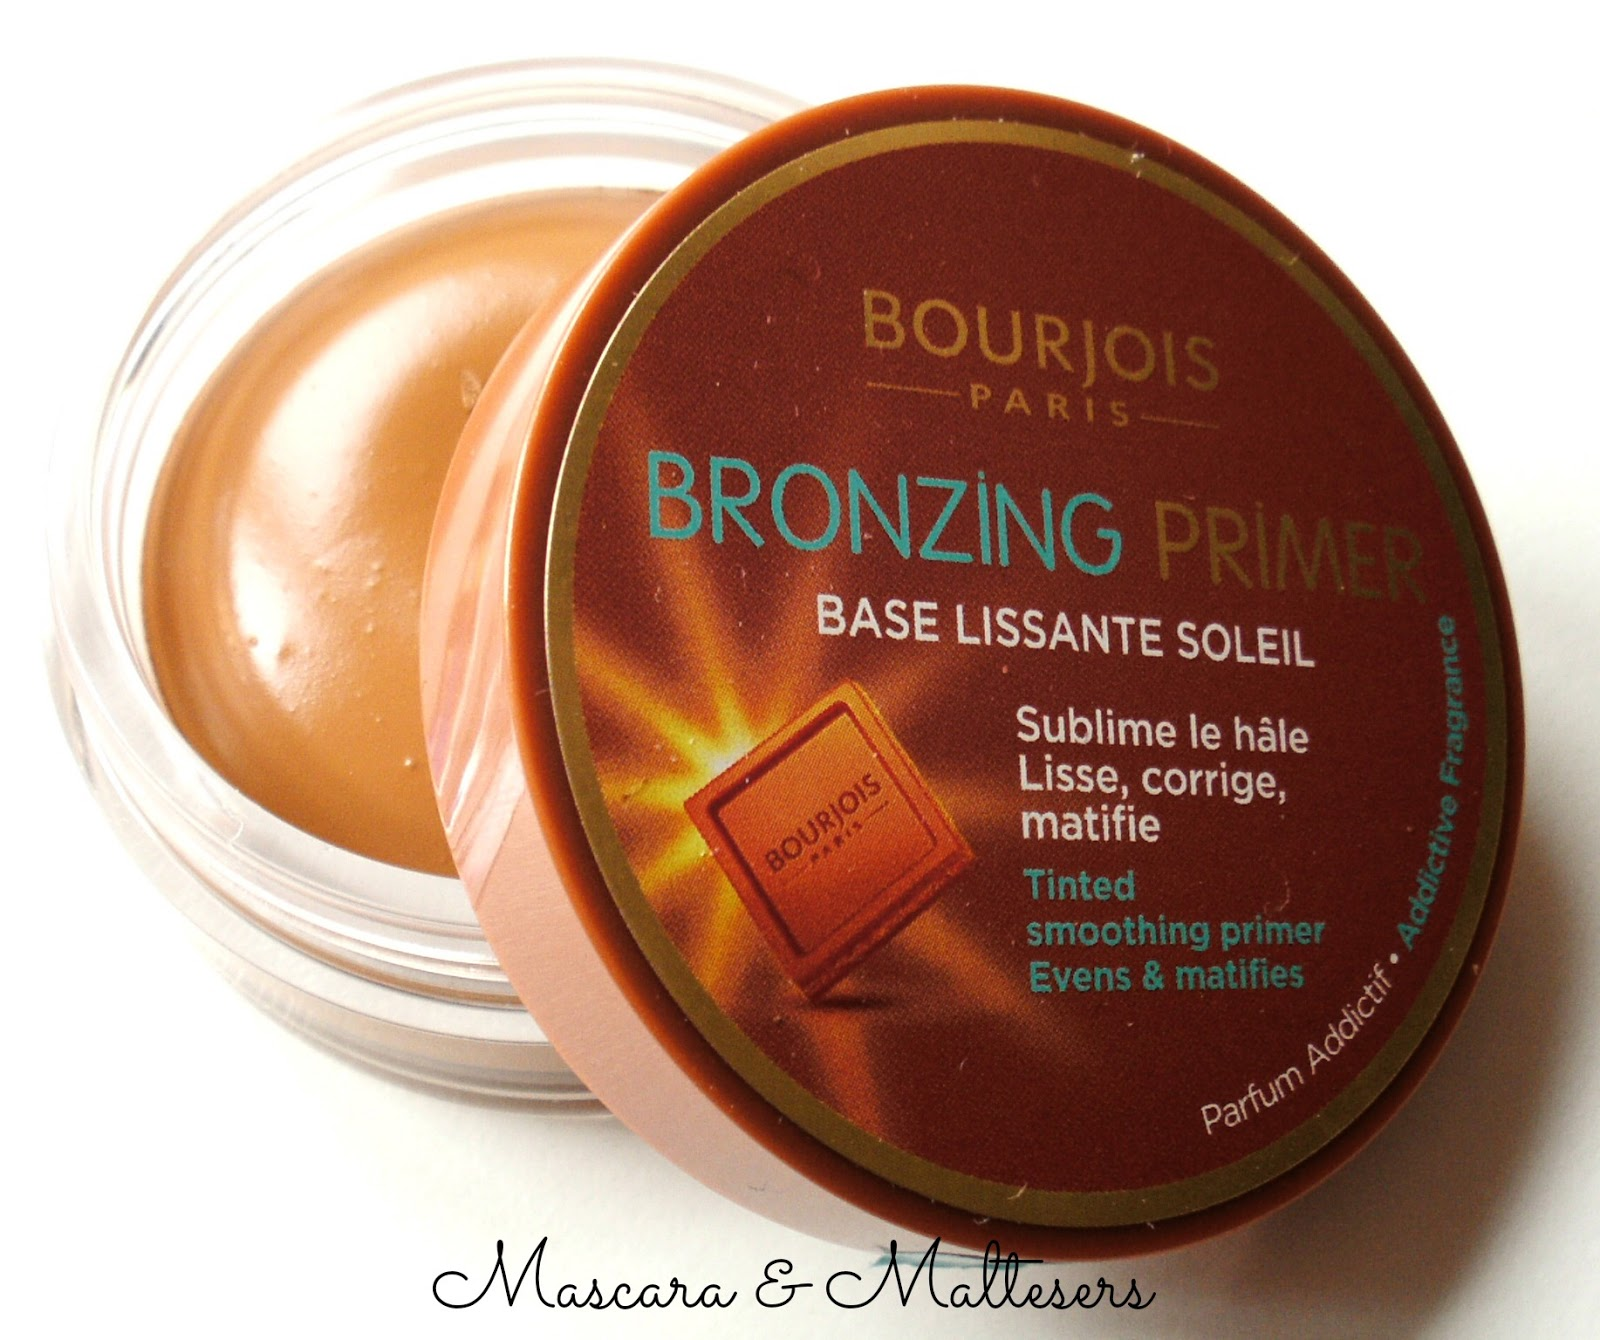 Bourjois Paris Bronzing Primer Lid